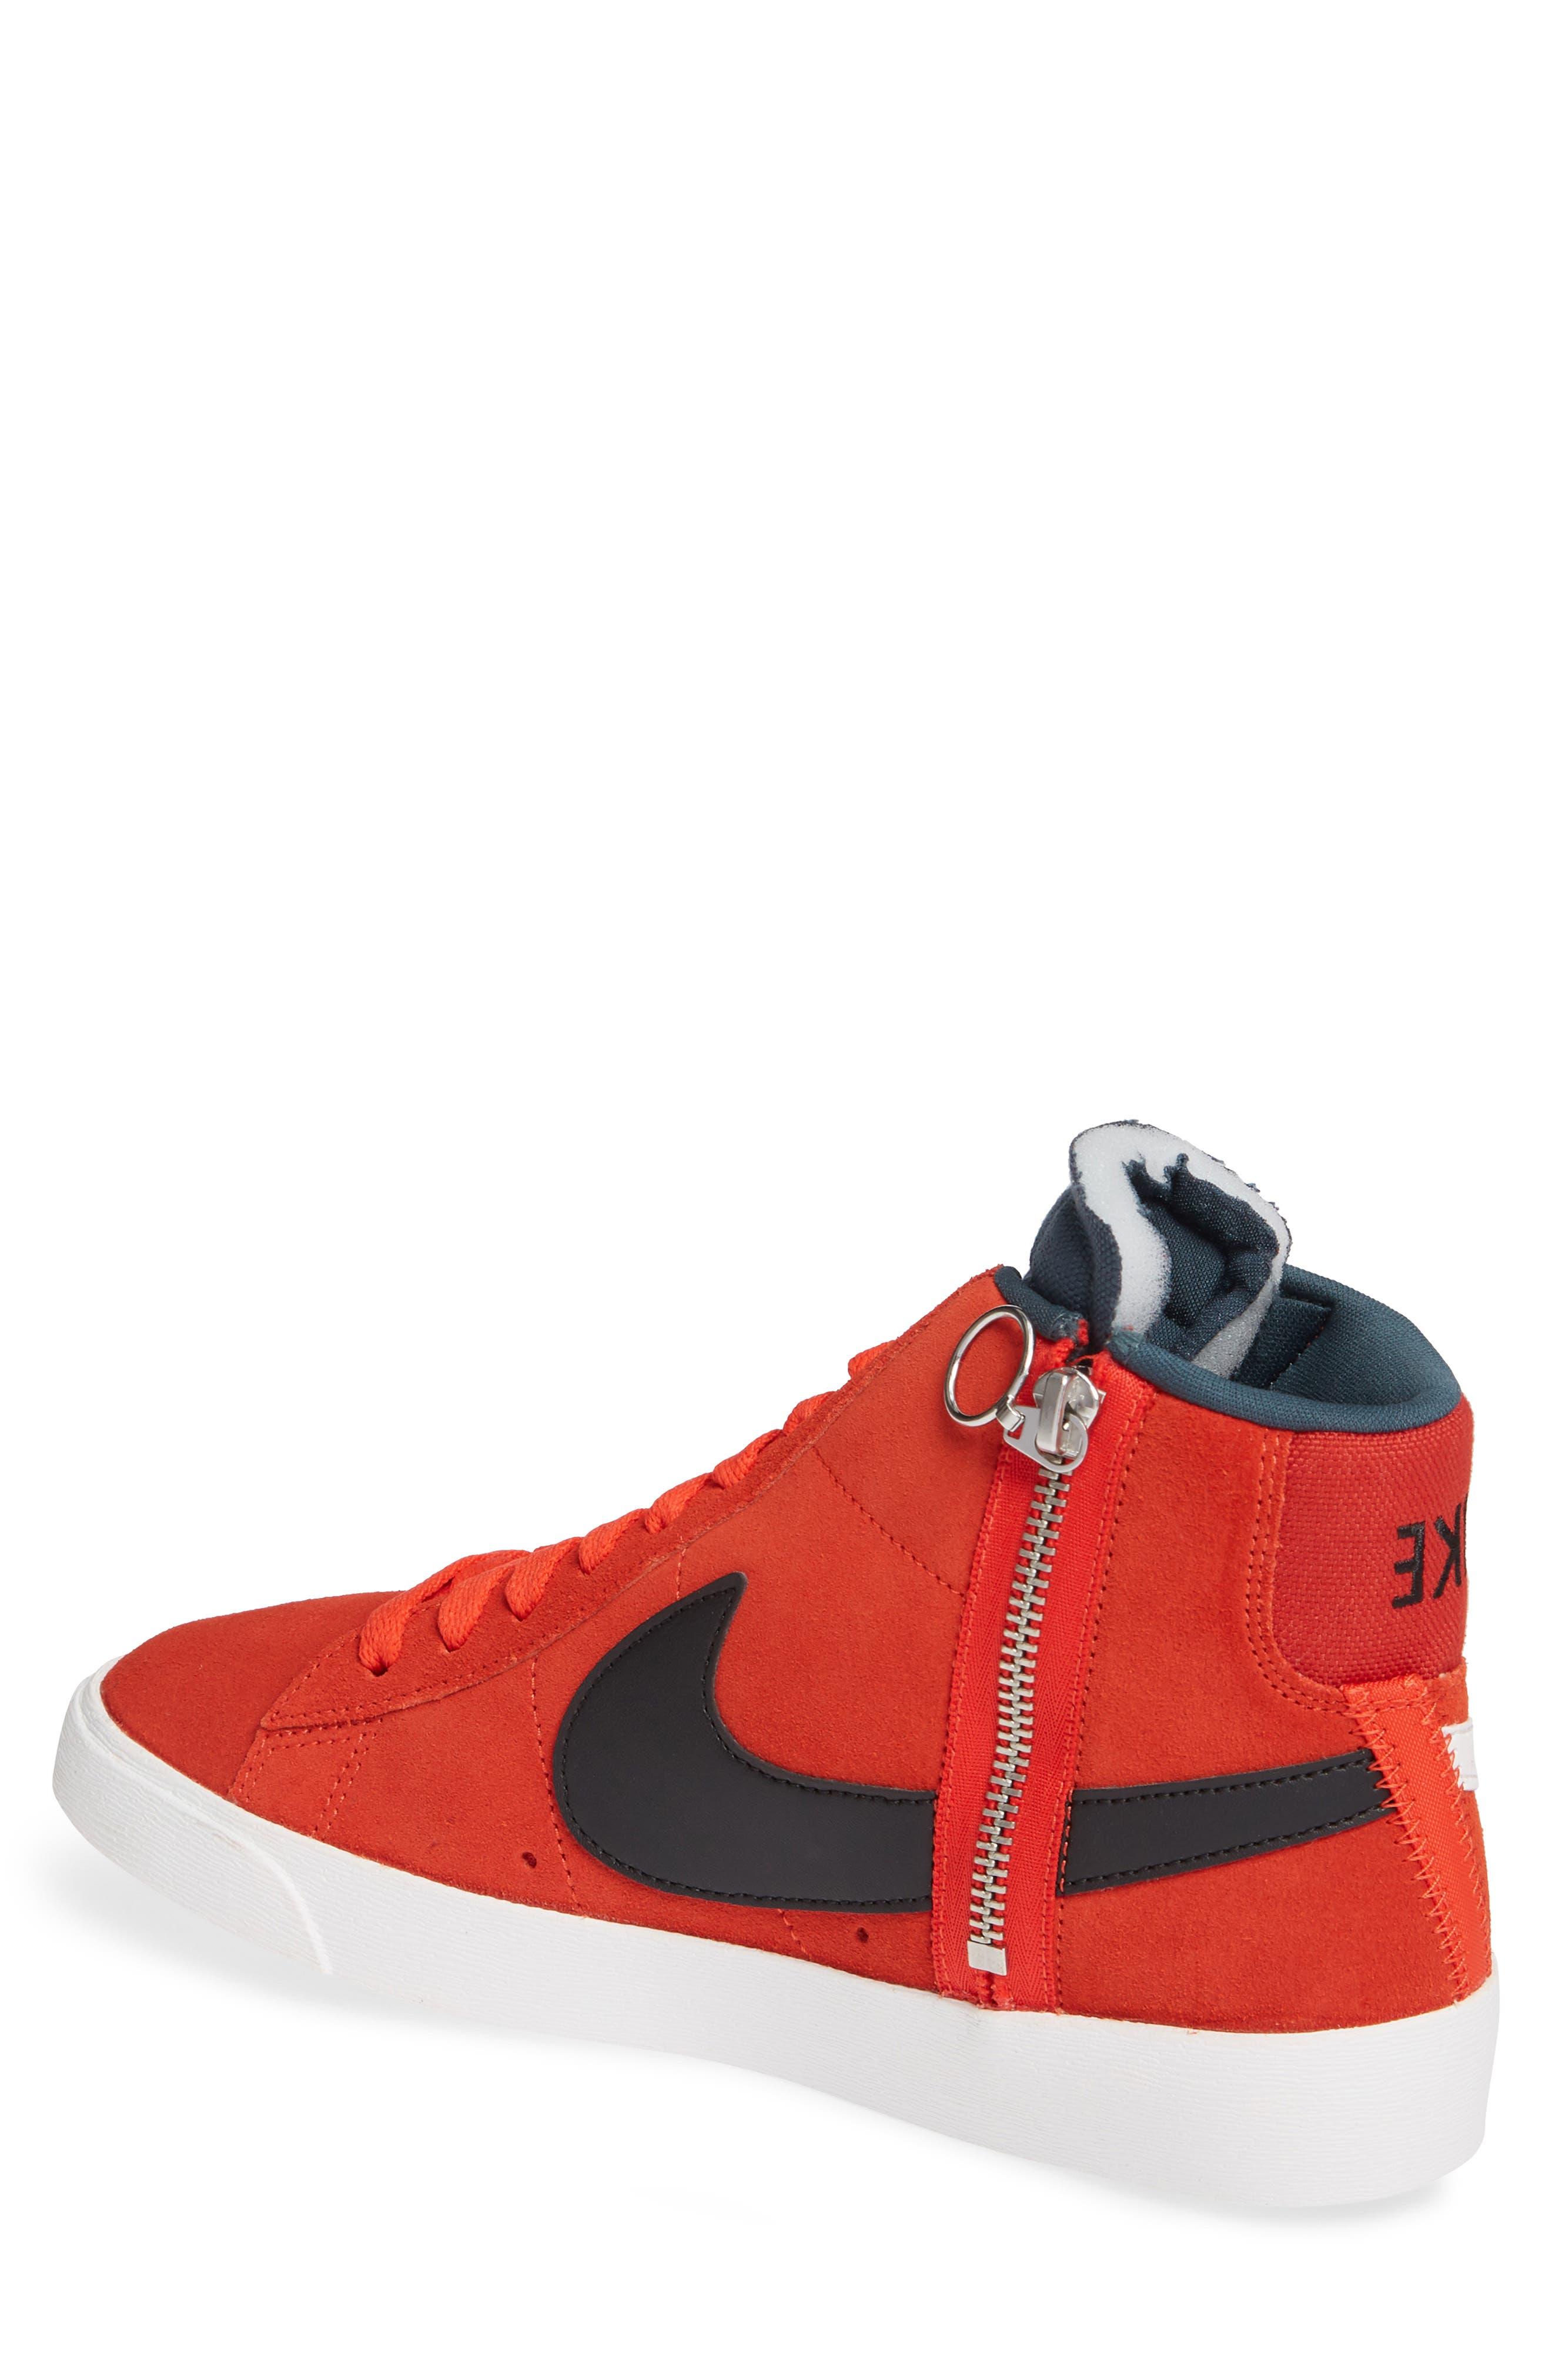 NIKE, Blazer Mid Rebel Sneaker, Alternate thumbnail 2, color, 601